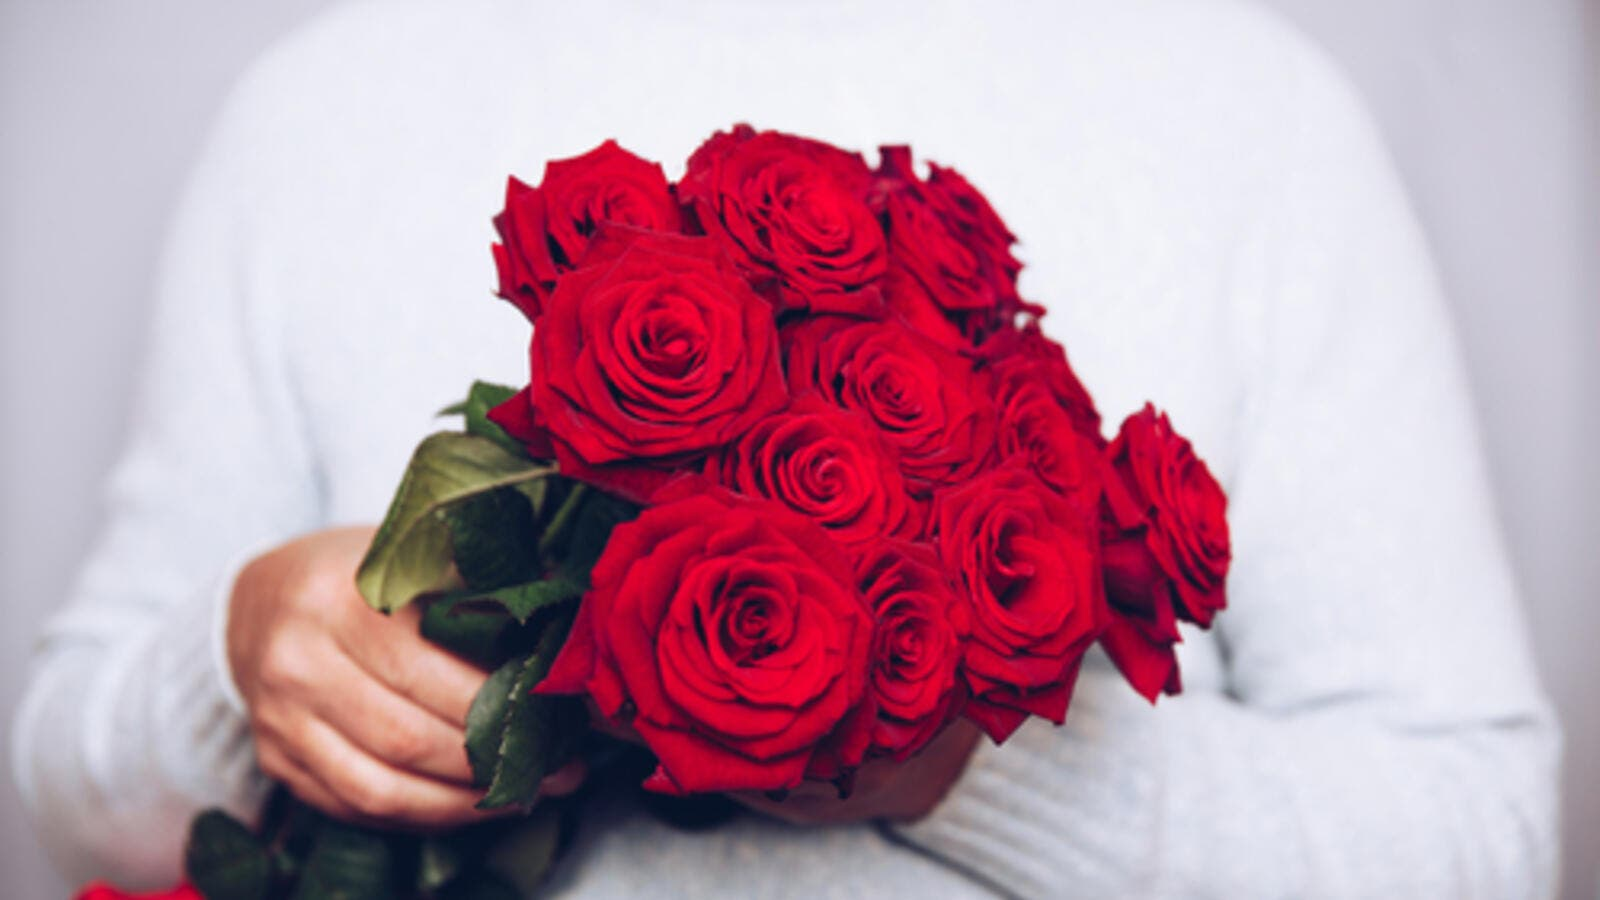 c8b4436b8 أفكار لهدايا الأحبة في عيد الحب | البوابة